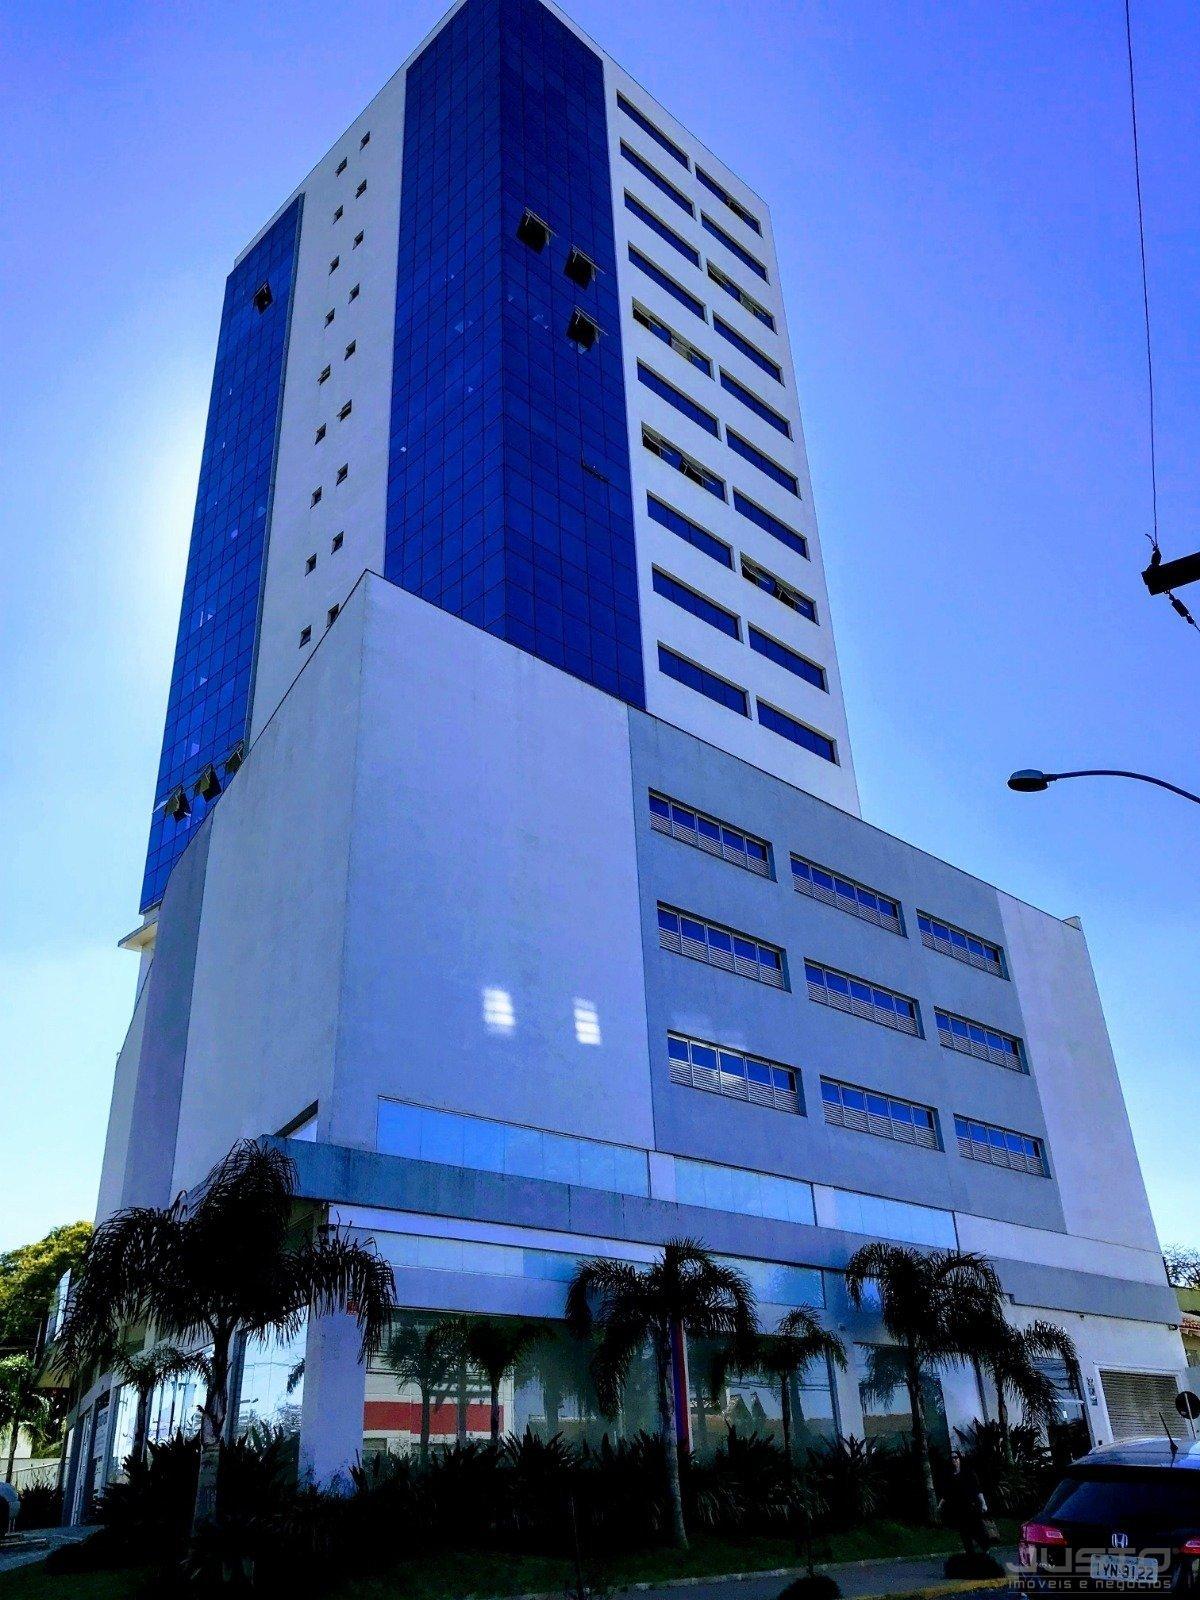 Conj/Sala Comercial Sao Jose Sao Leopoldo